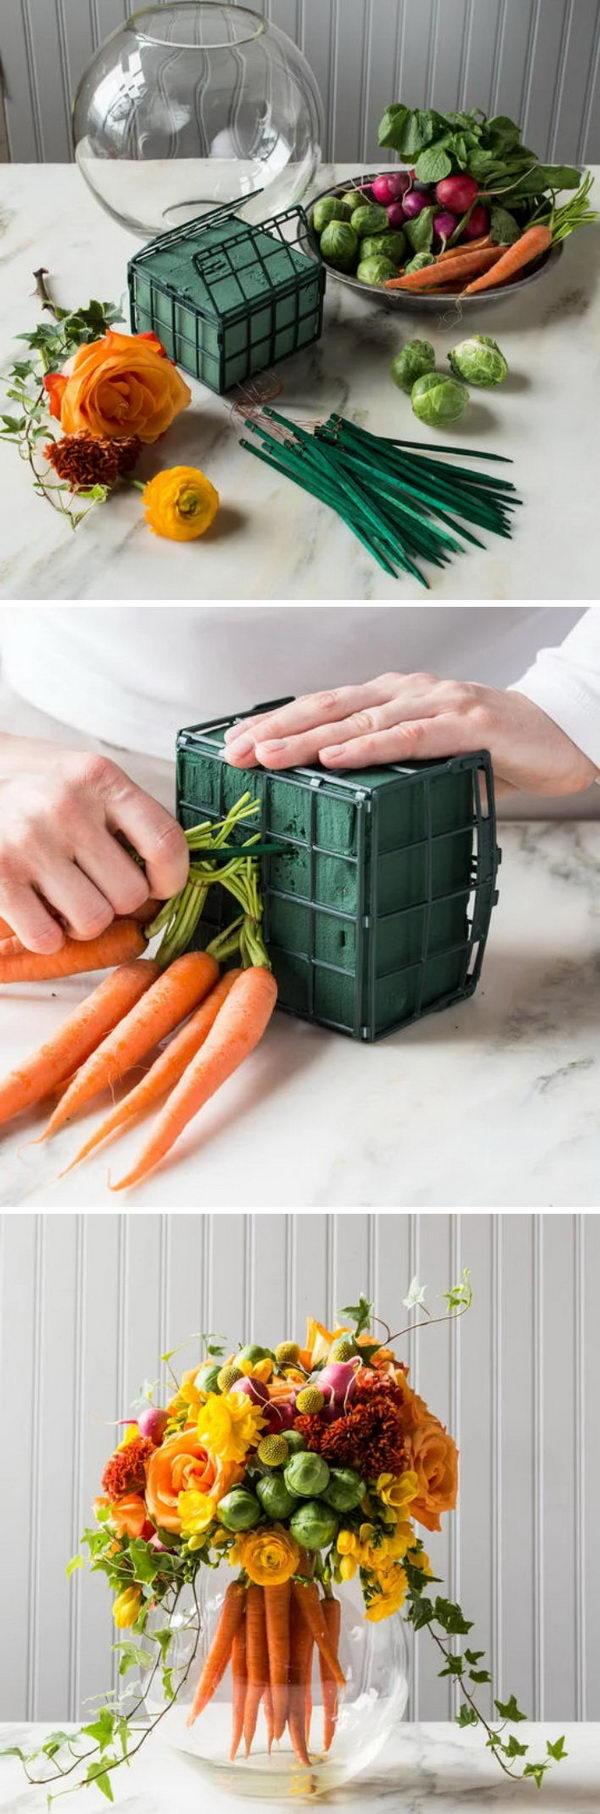 DIY Floral Arrangements With A Bouquet Of Bright Carrots